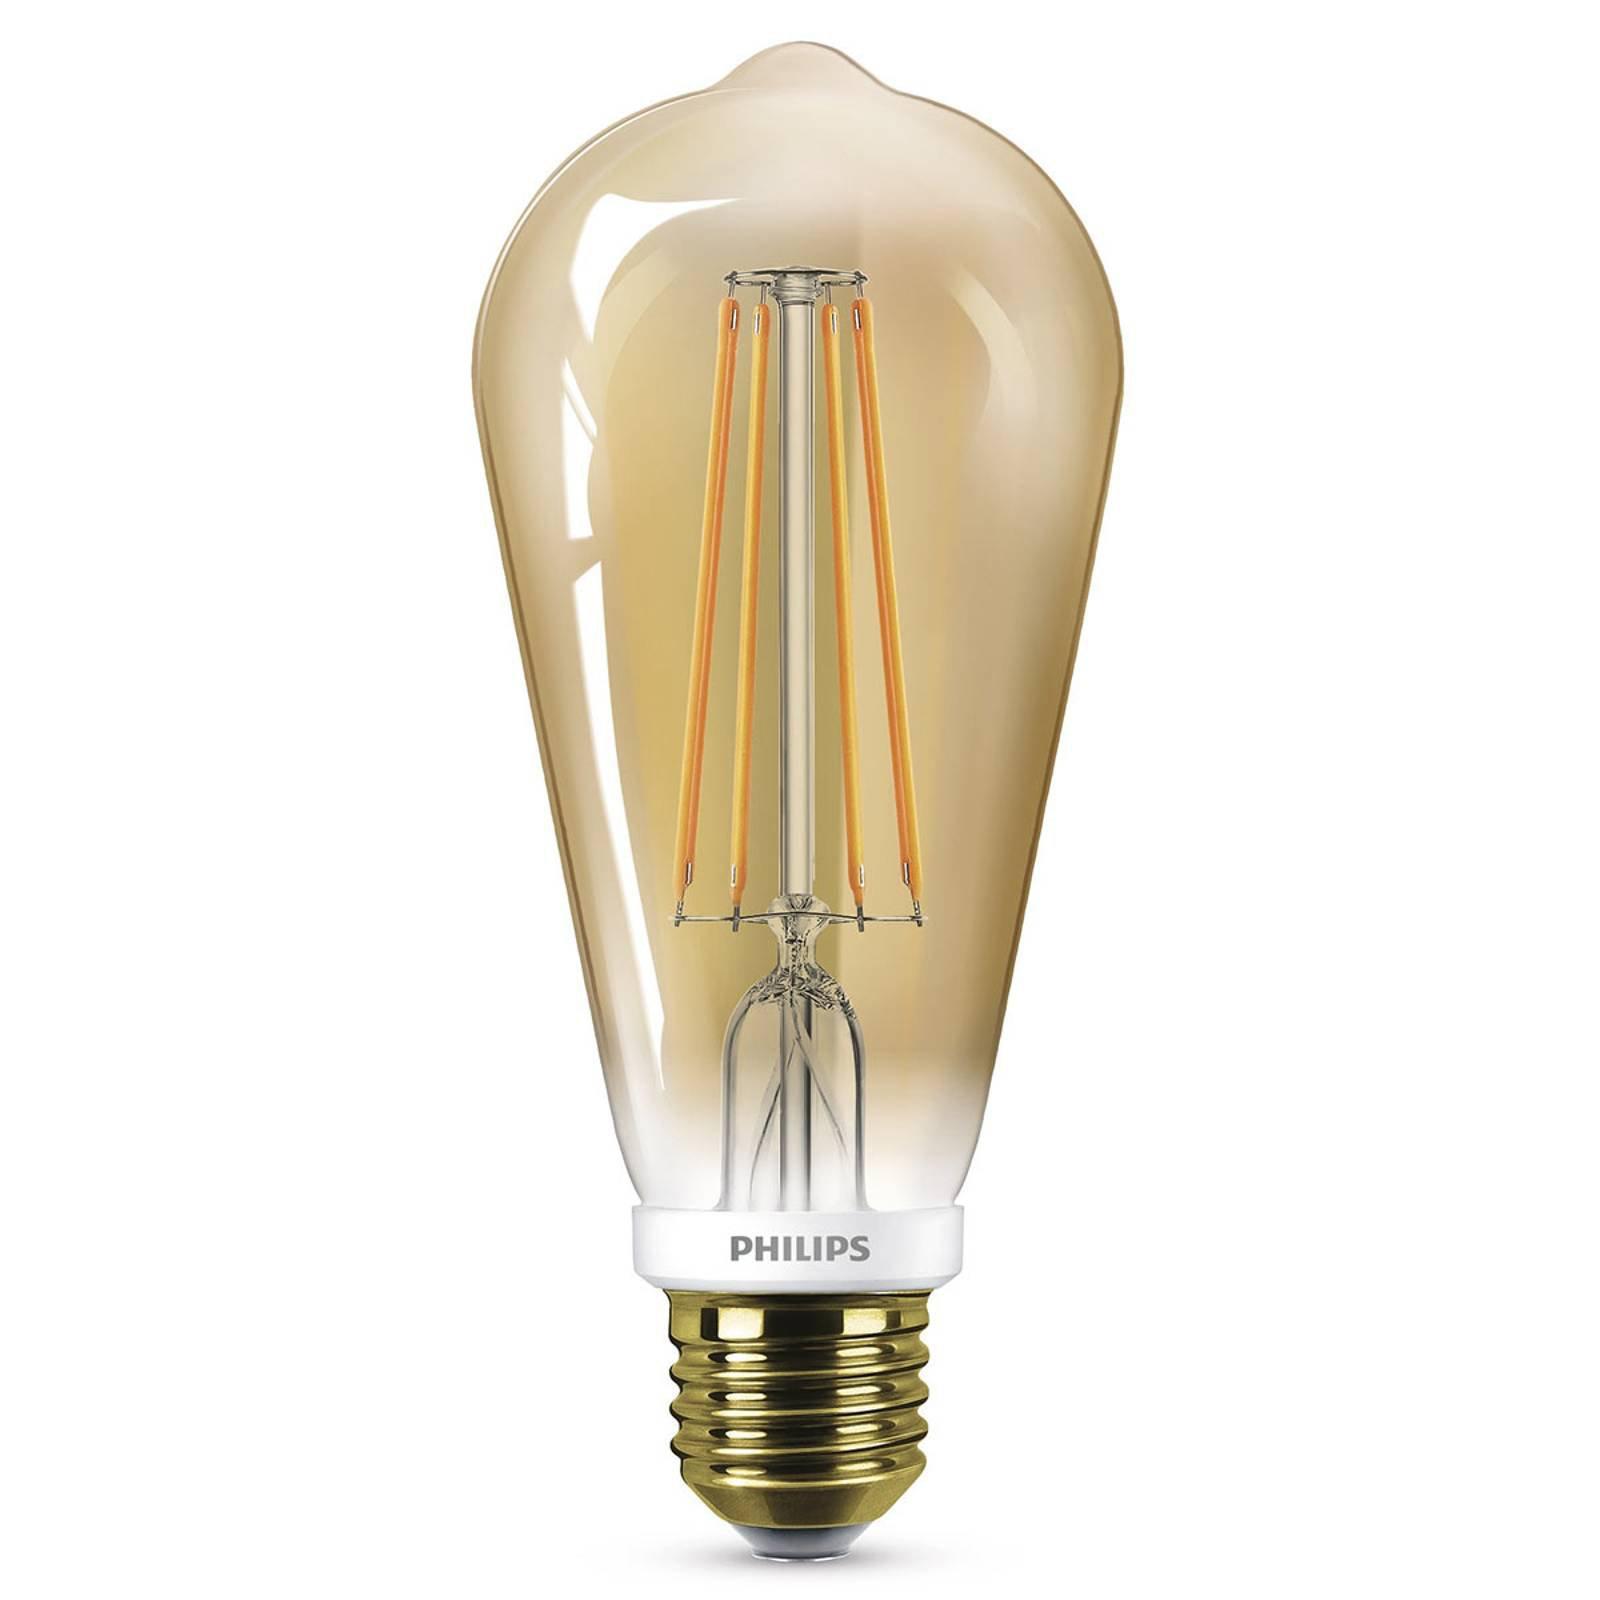 Philips LED-pære E27 ST64 5,5 W gull, dimbar